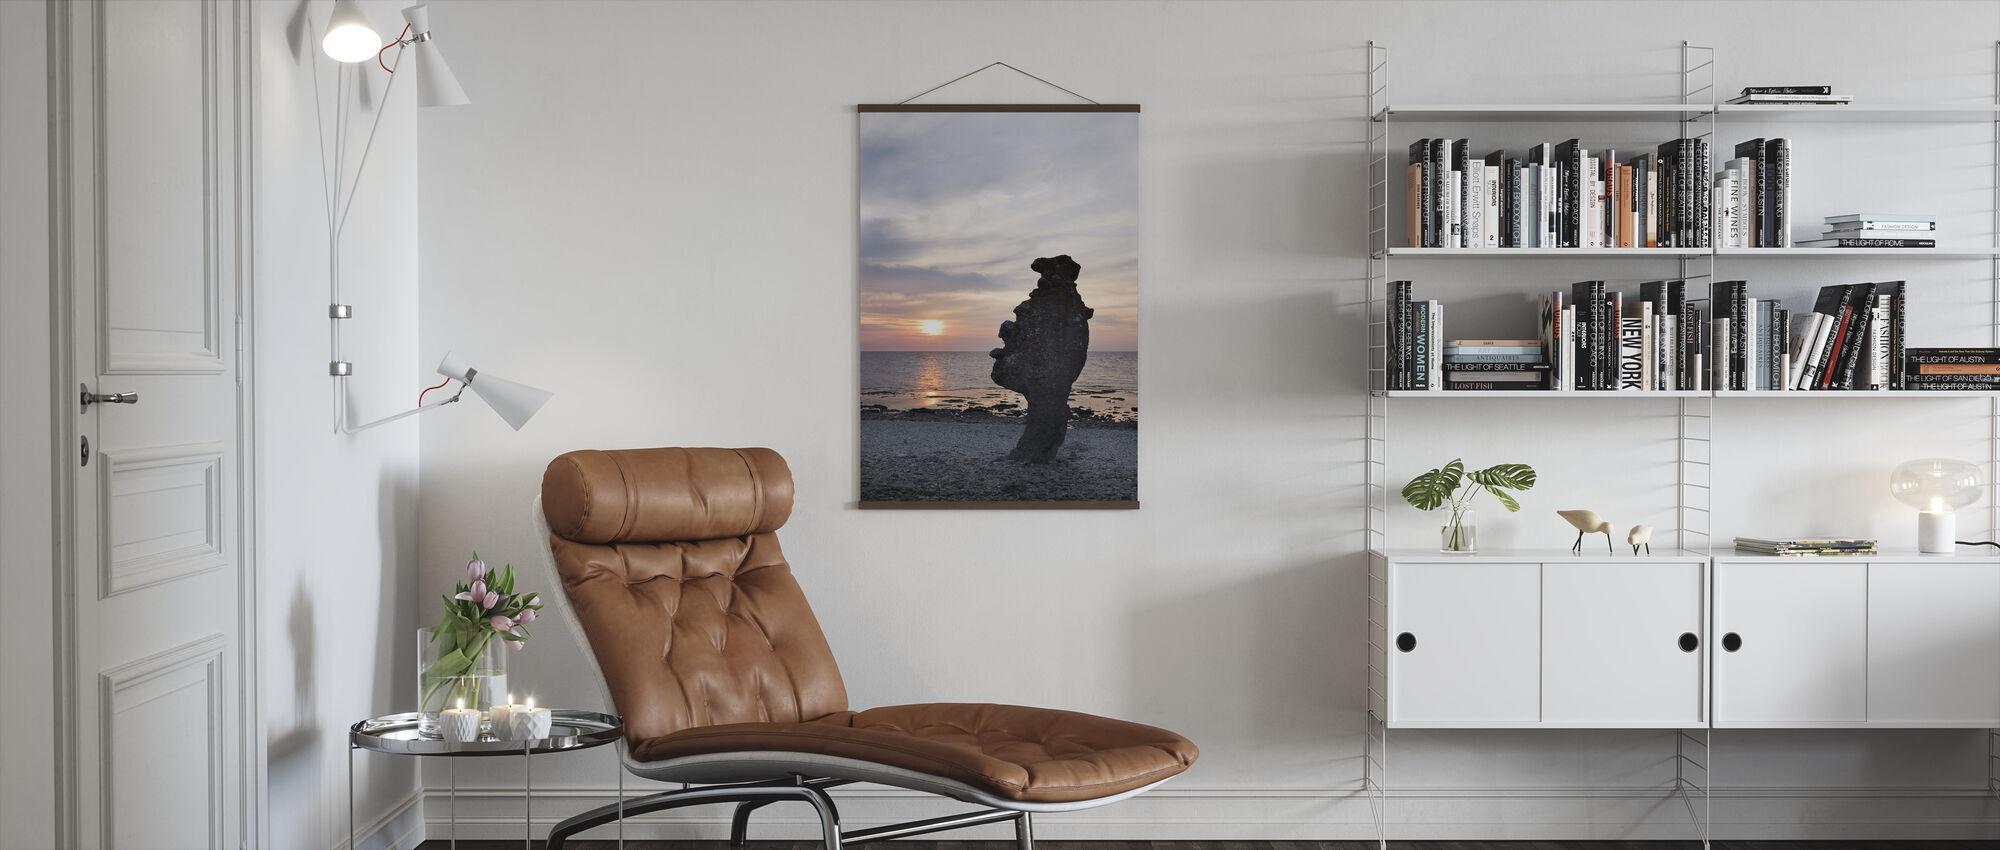 Gotland Rauk - Poster - Living Room